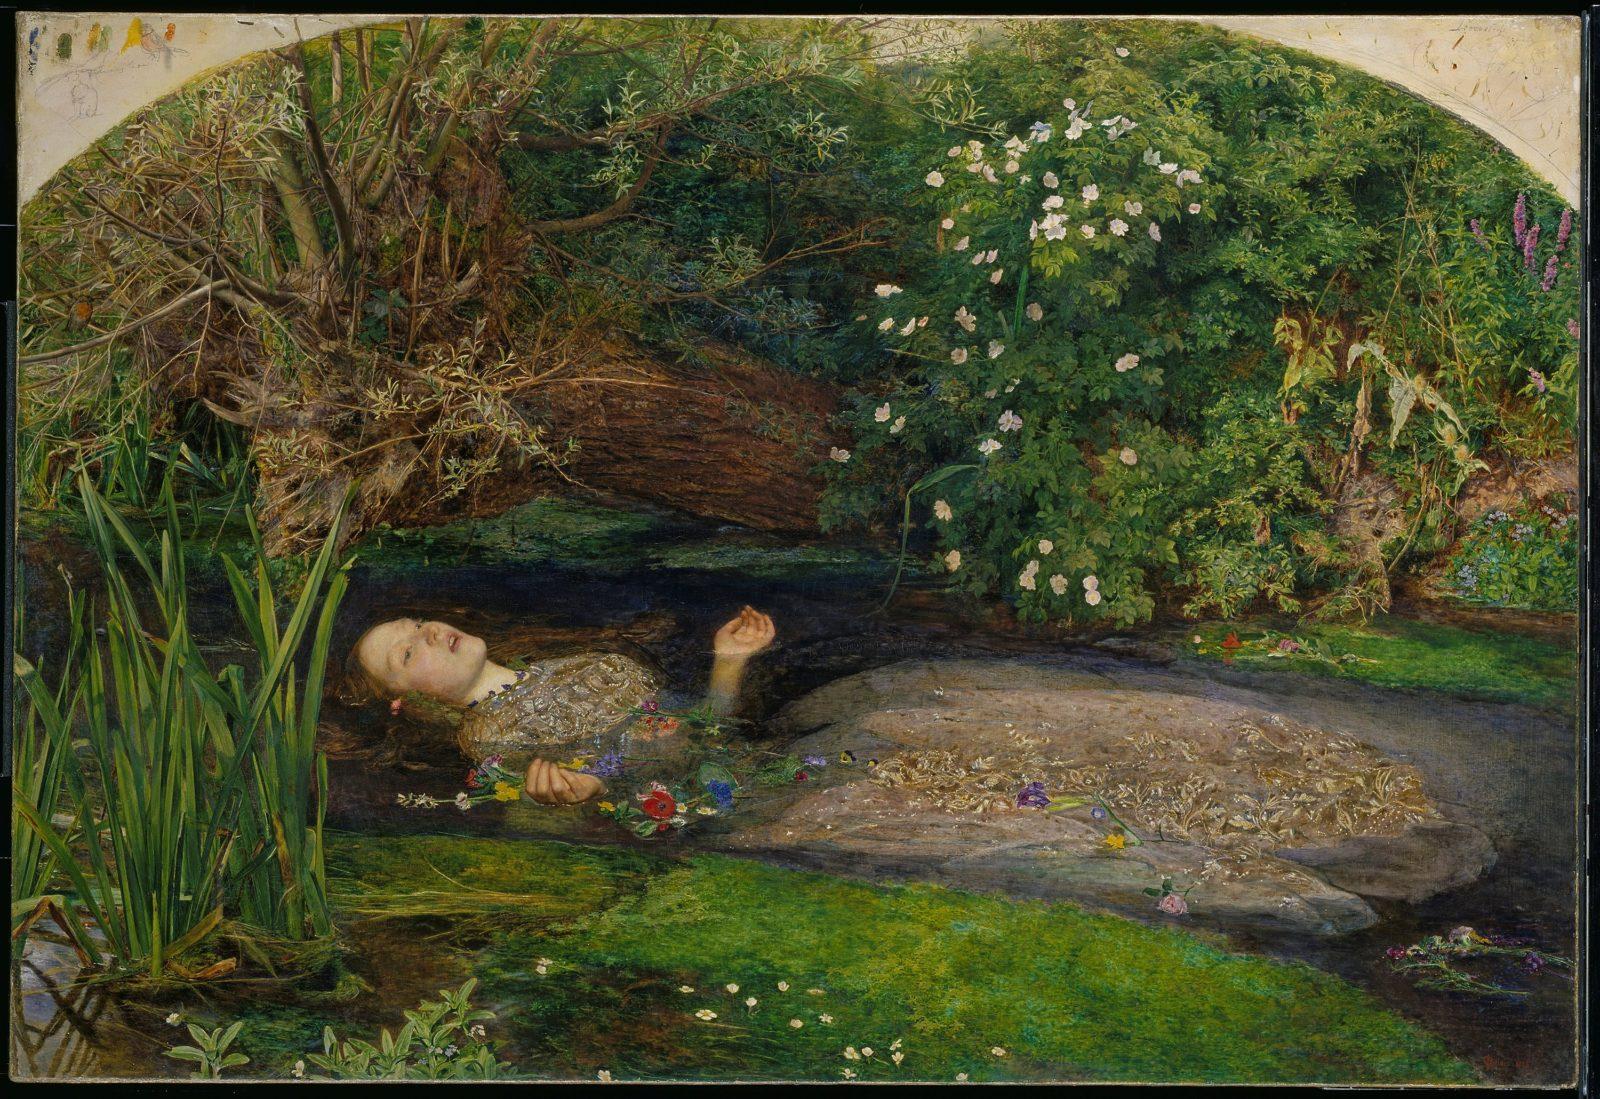 John E. Millais Ophelia 1851-52, oil on canvas, Tate © Tate, London 2018